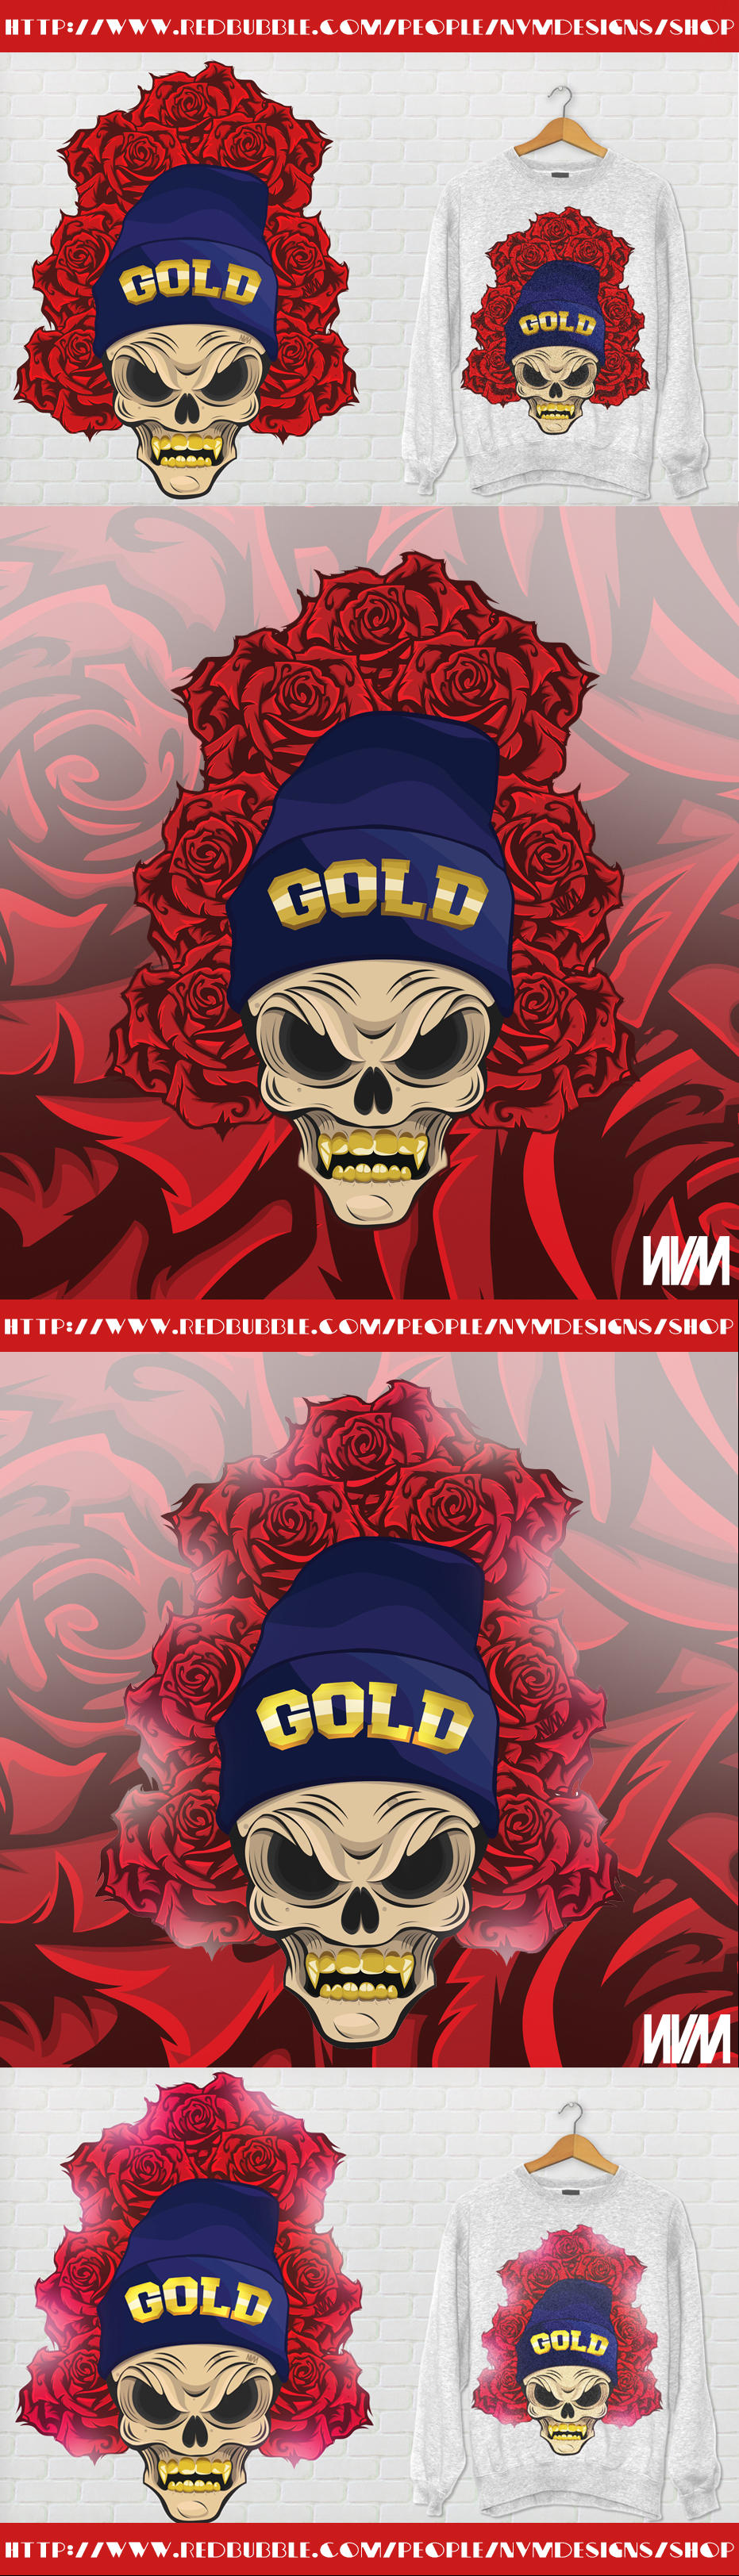 Skull N Roses t-shirt design by LazyN